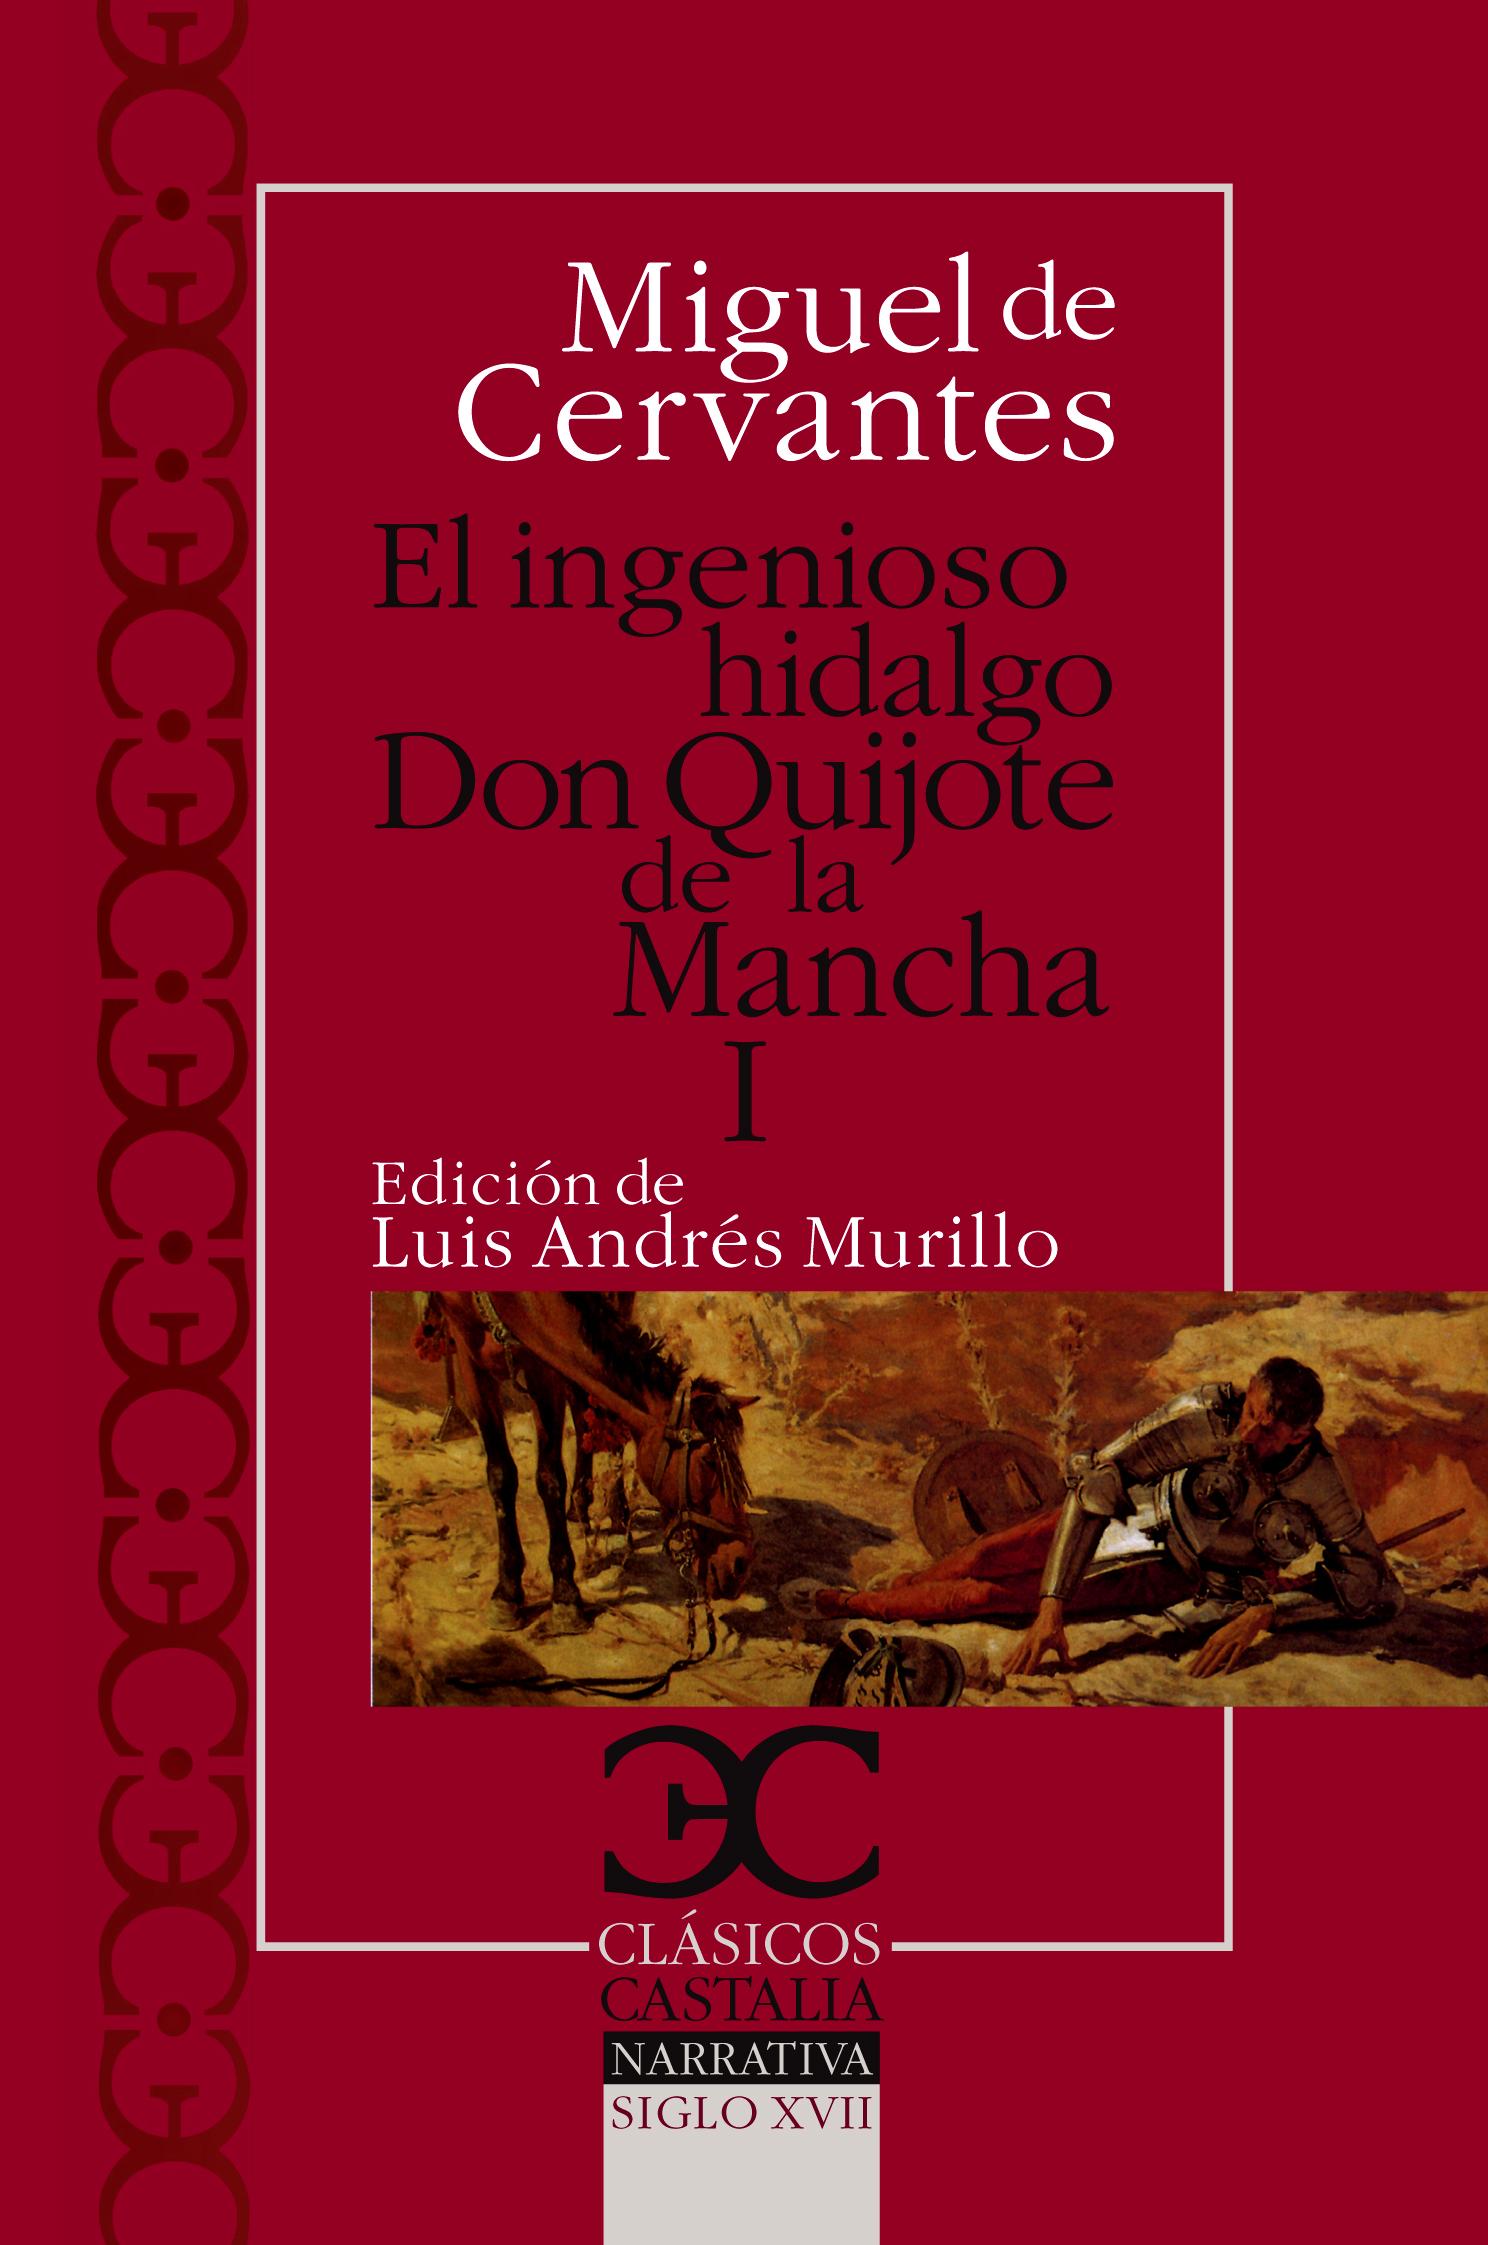 El Ingenioso hidalgo Don Quijote de la Mancha (I)